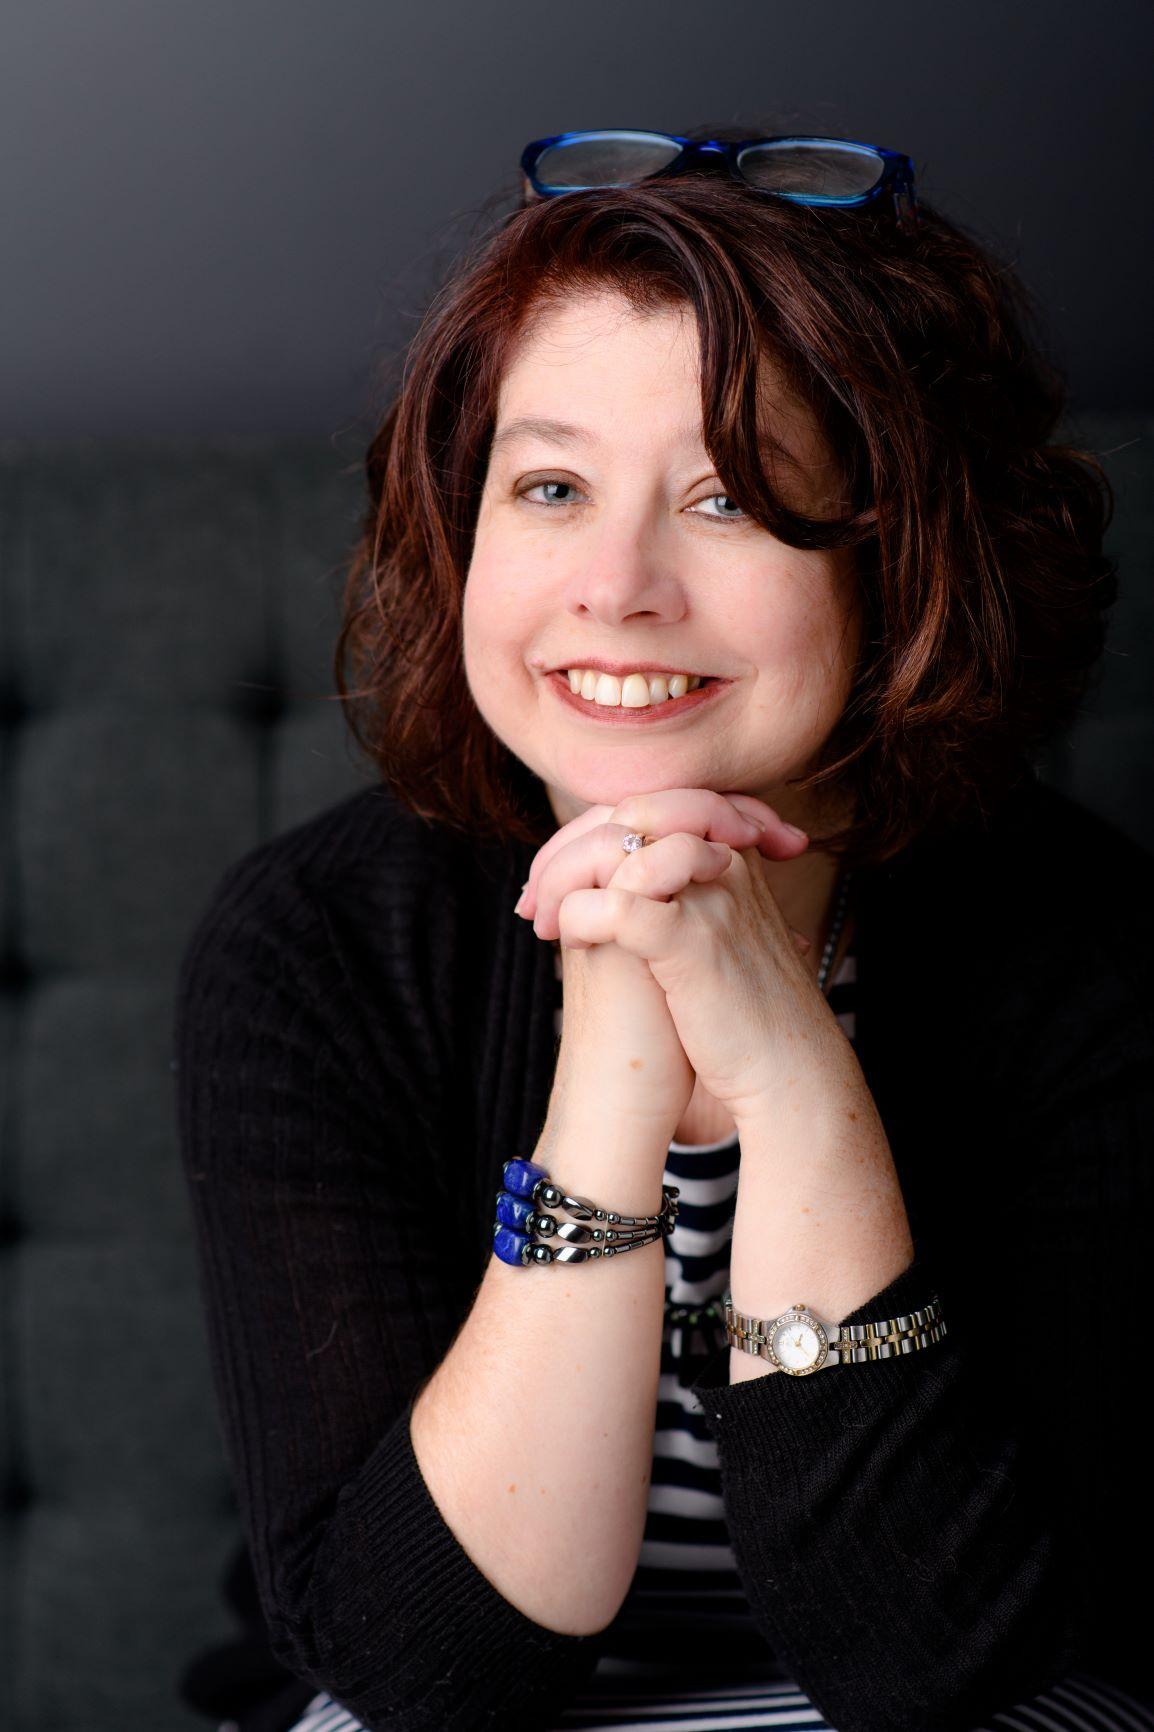 Pam McFarland